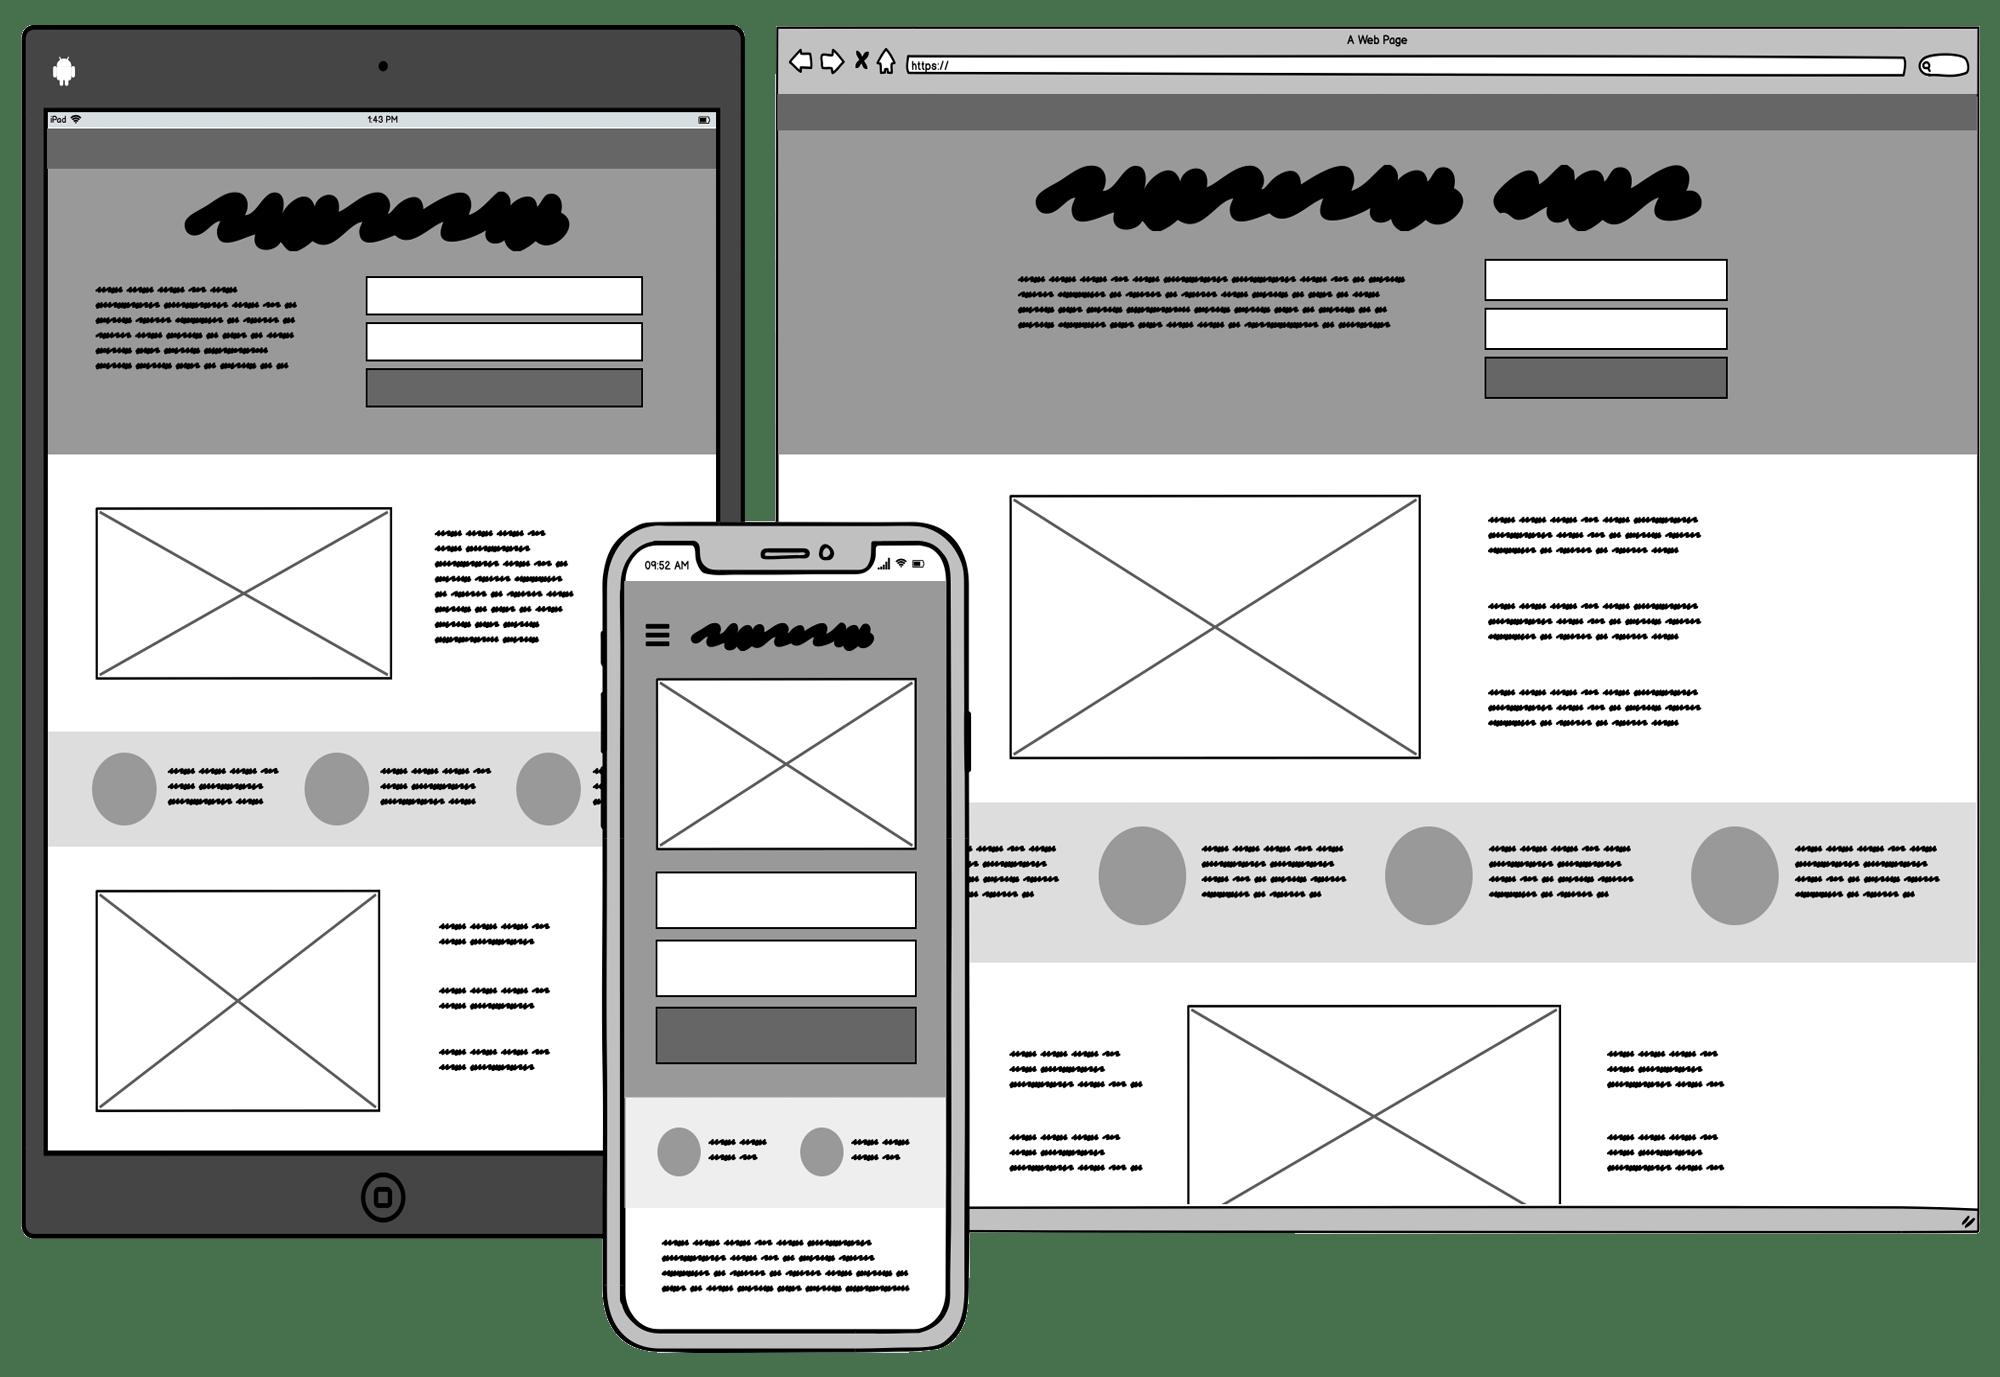 Balsamiq mobile UI design.